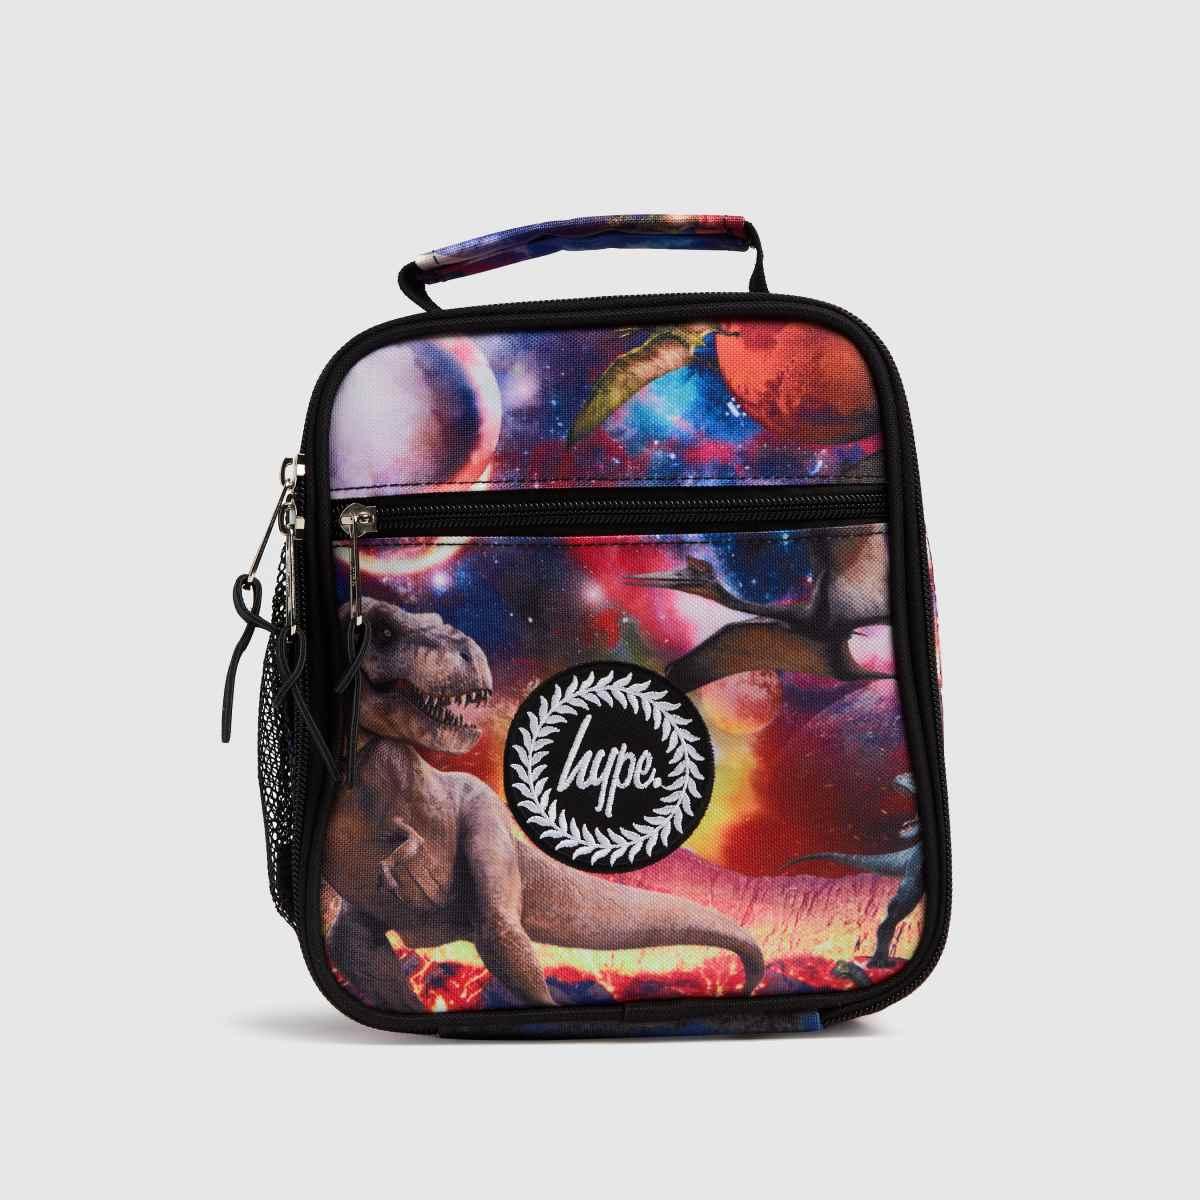 Hype Multi Space Dinosaur Lunch Bag